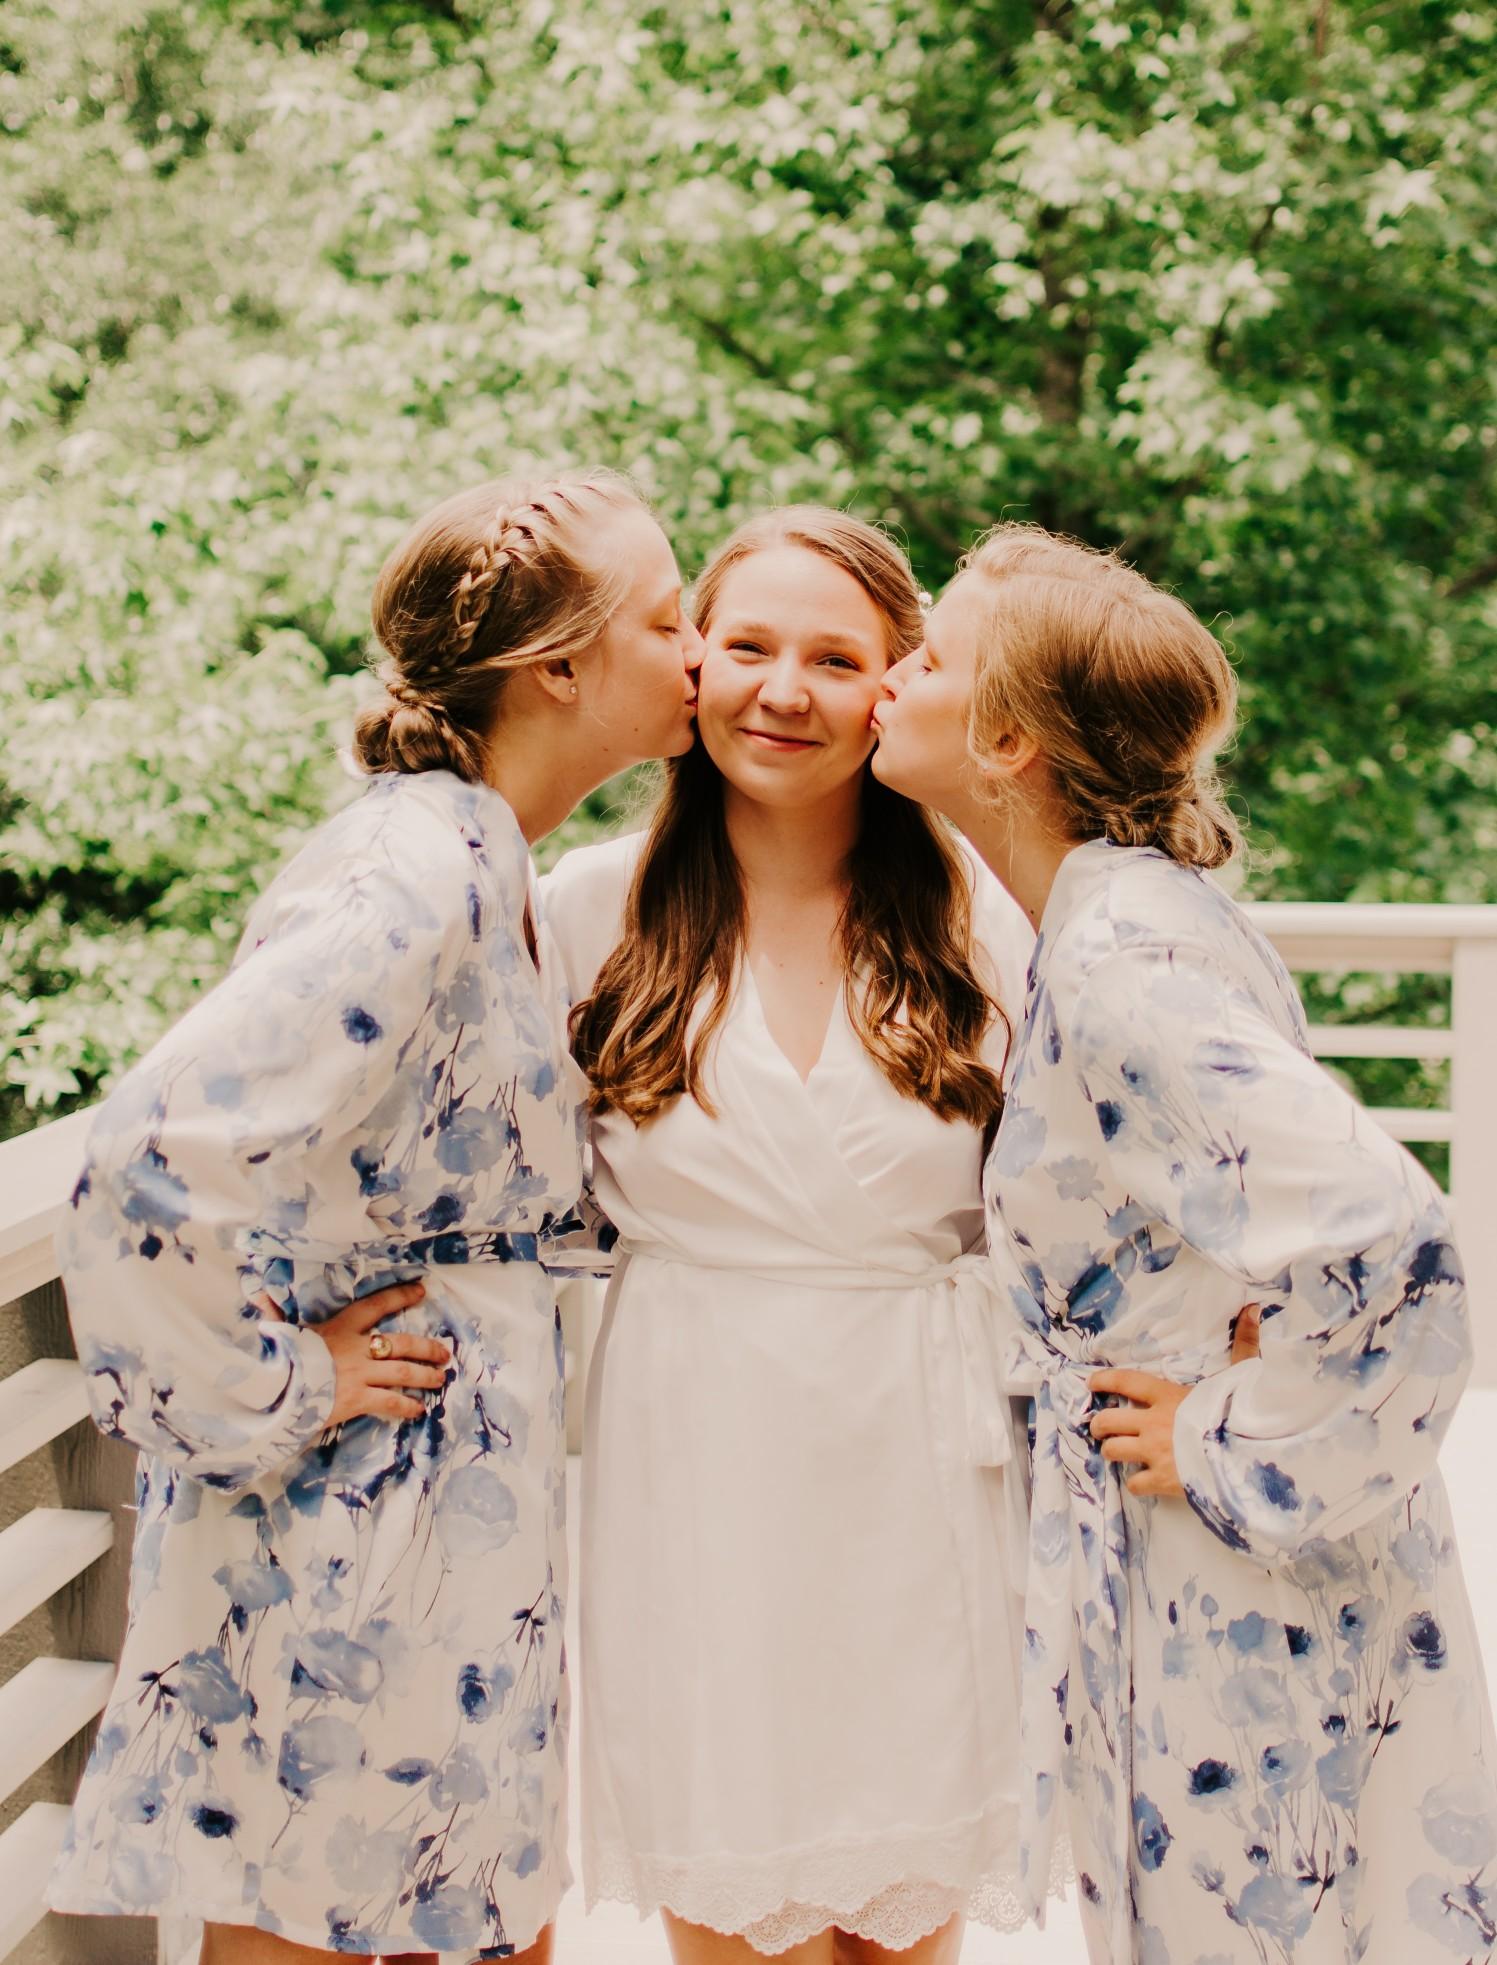 bridesmaids-wedding-photography.jpg.